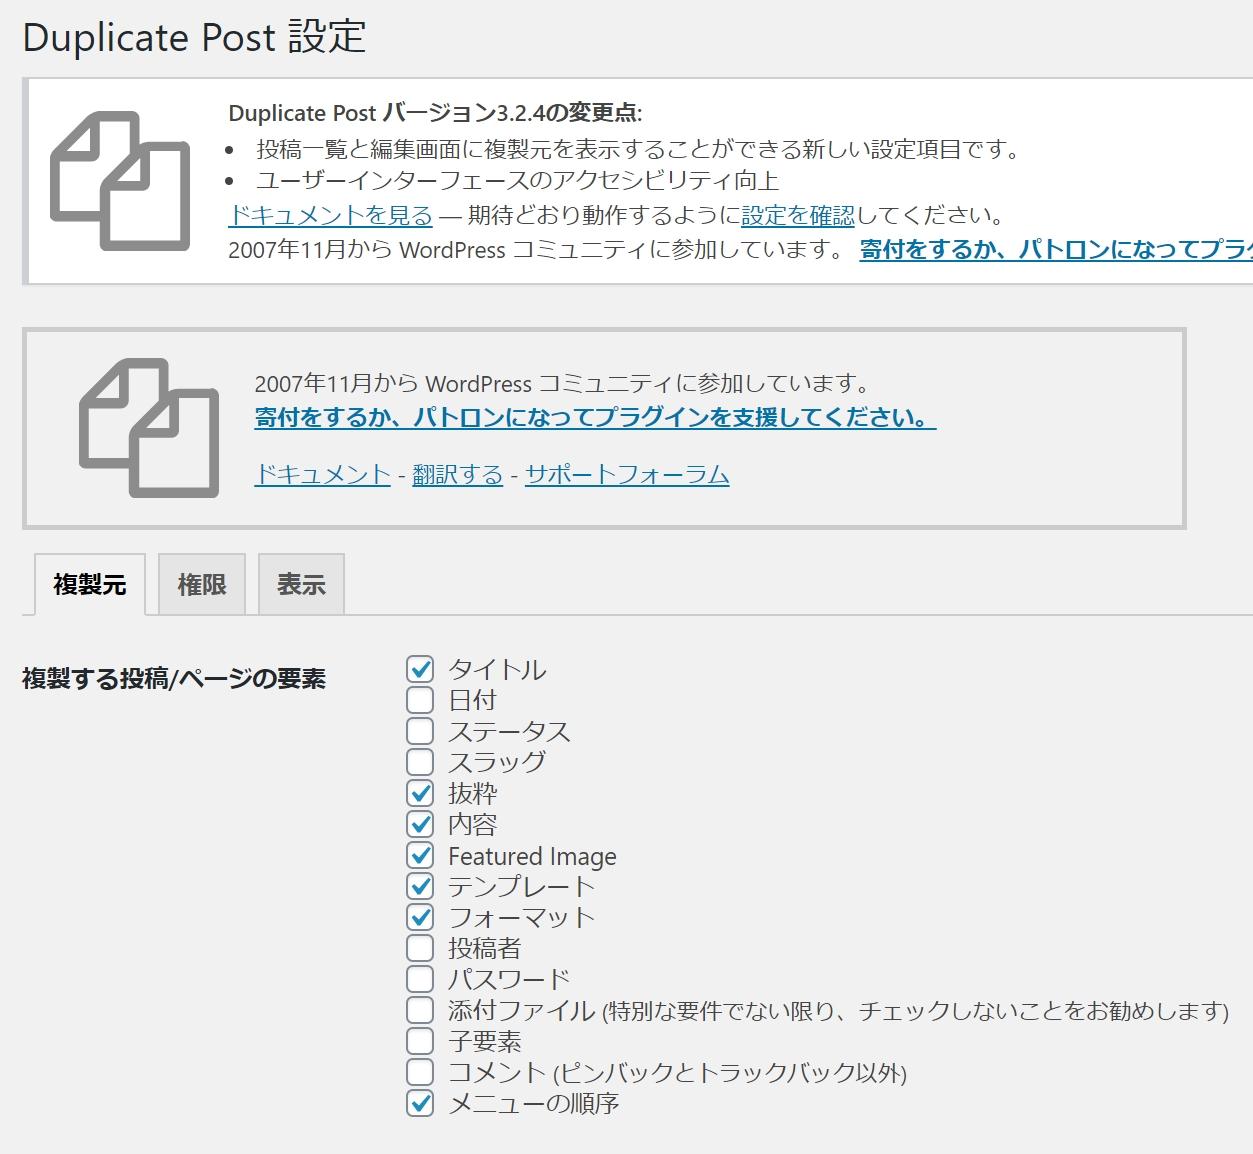 Duplicate Post_configuration-06